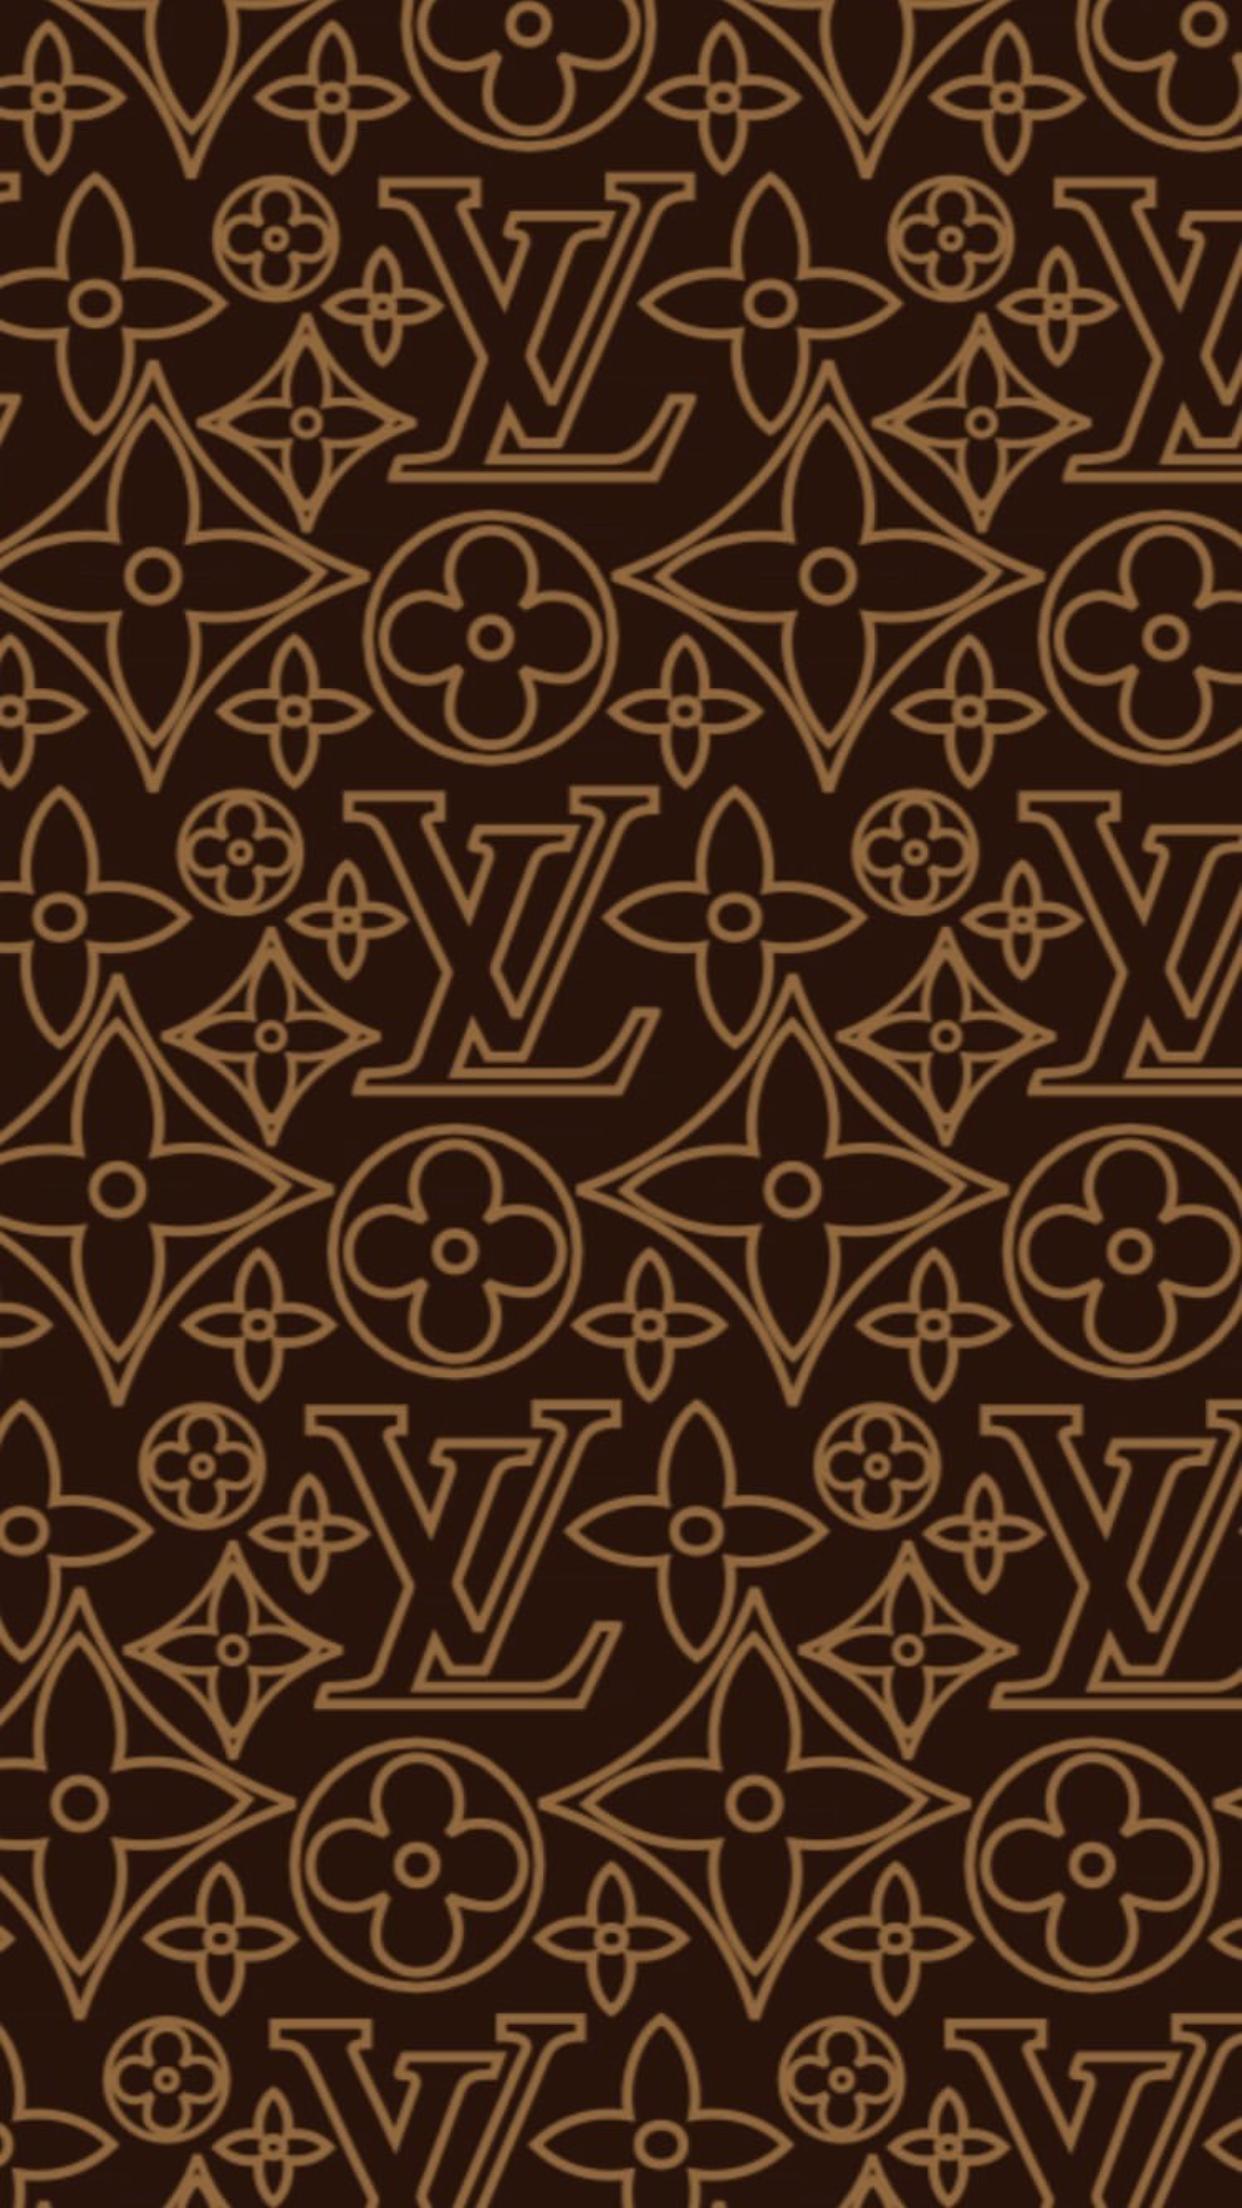 Lv Wallpaper Hypebeast Wallpaper Hype Wallpaper Black Wallpaper Iphone